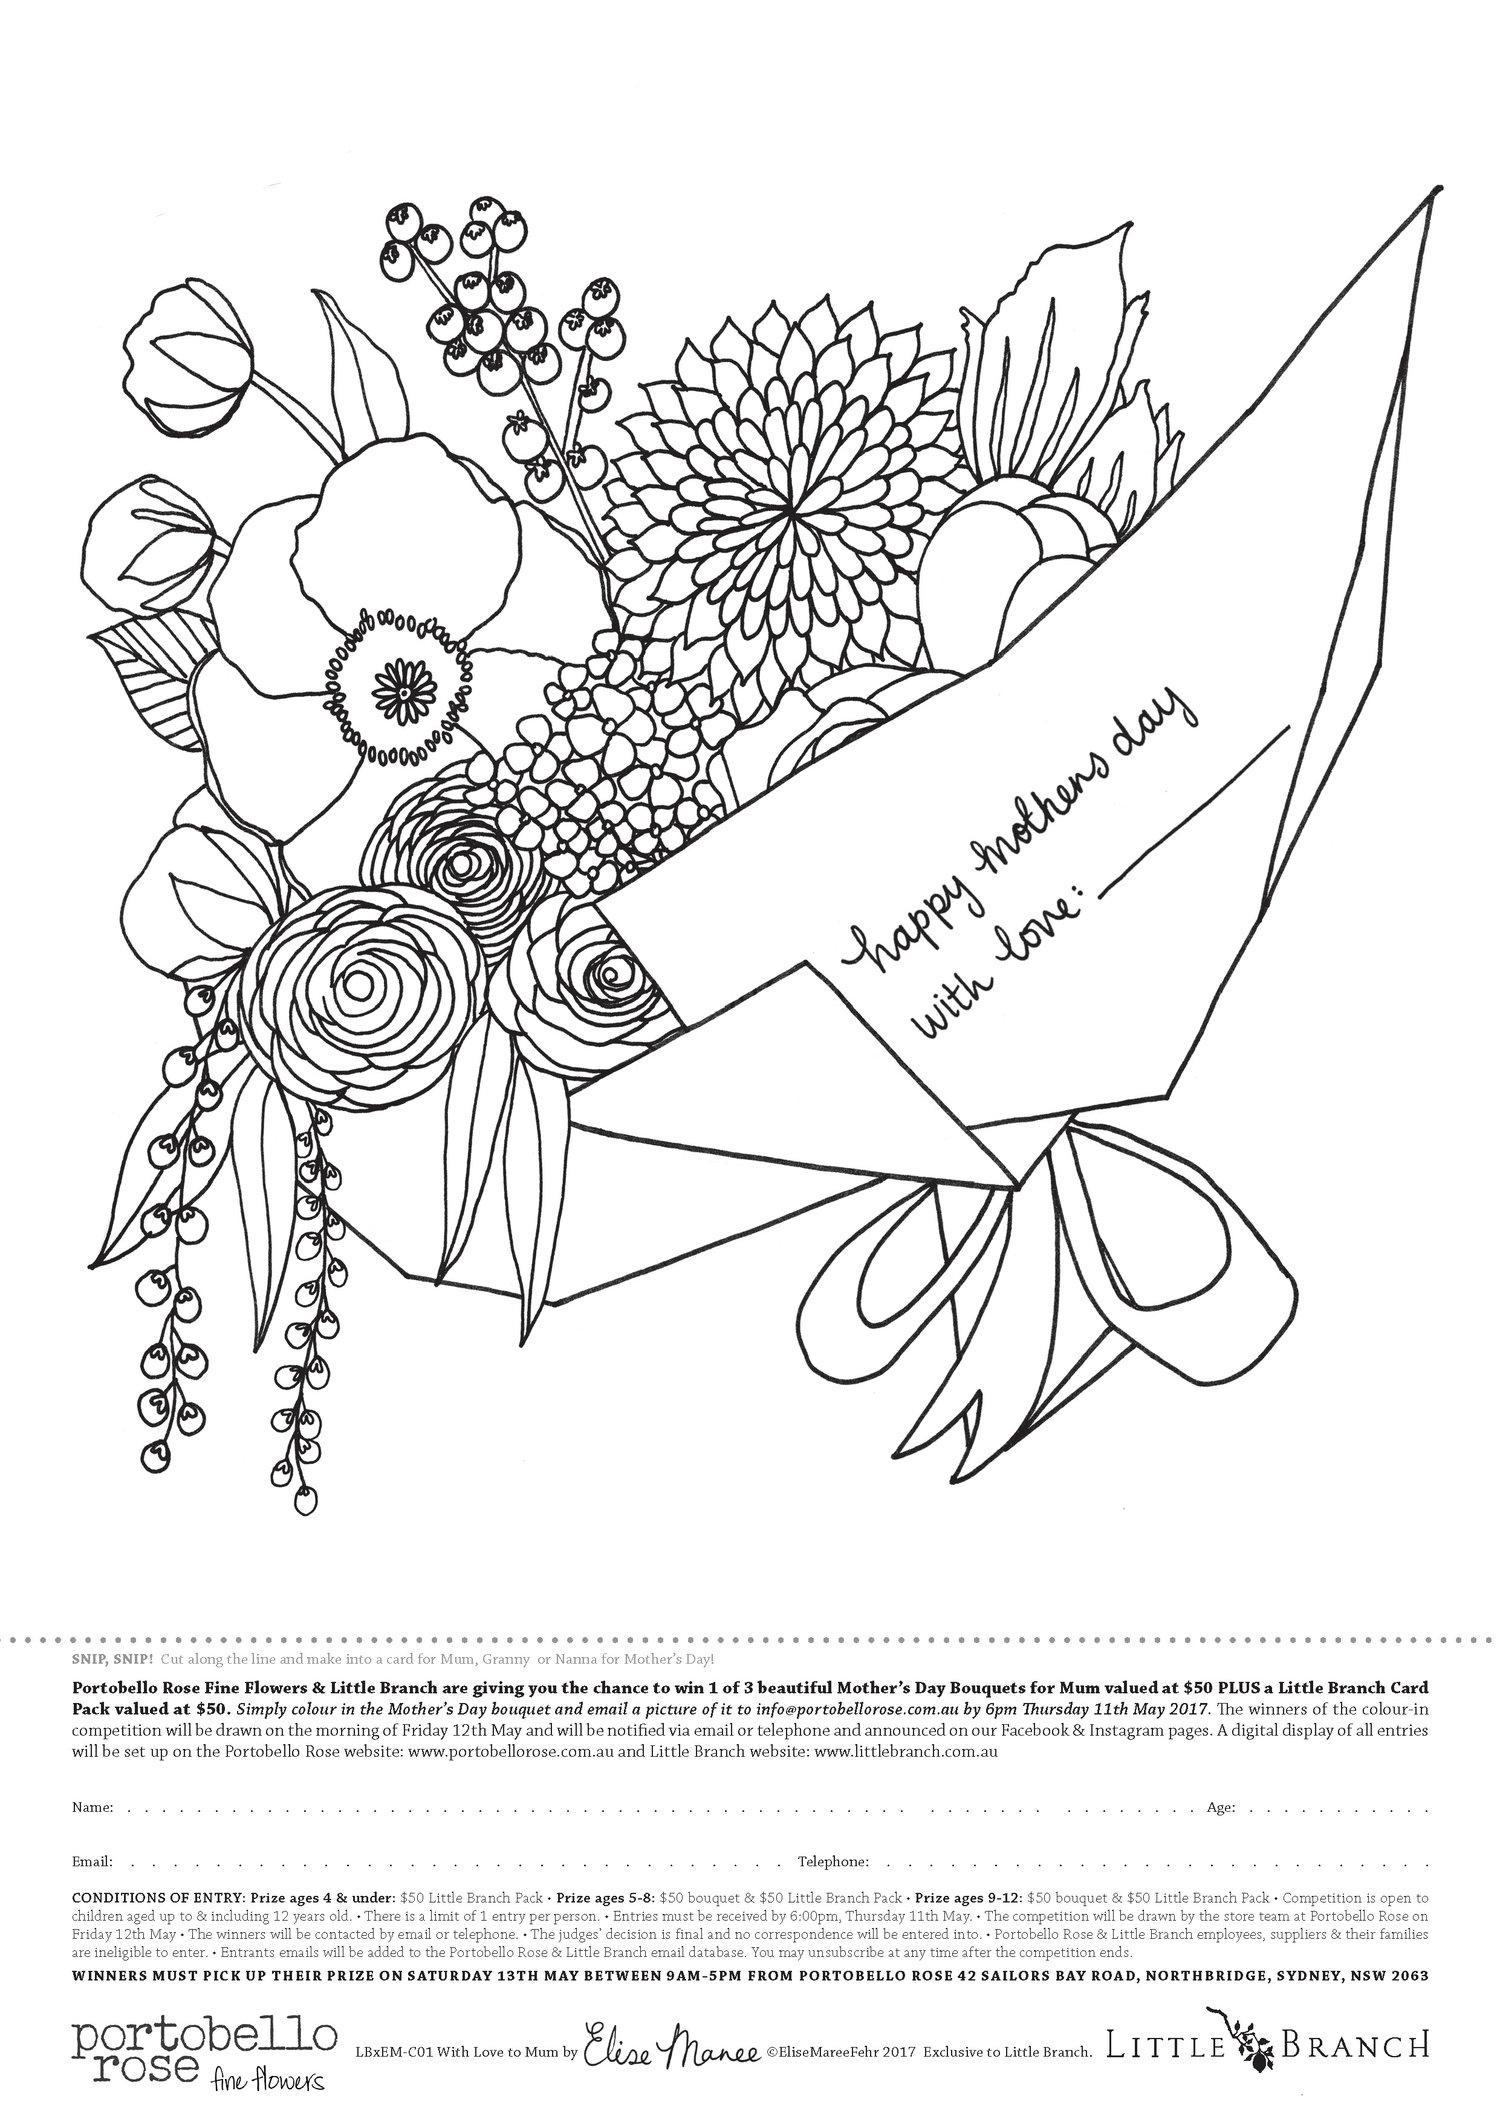 littlebranch-portobellorose-mothers-day-competition.jpg